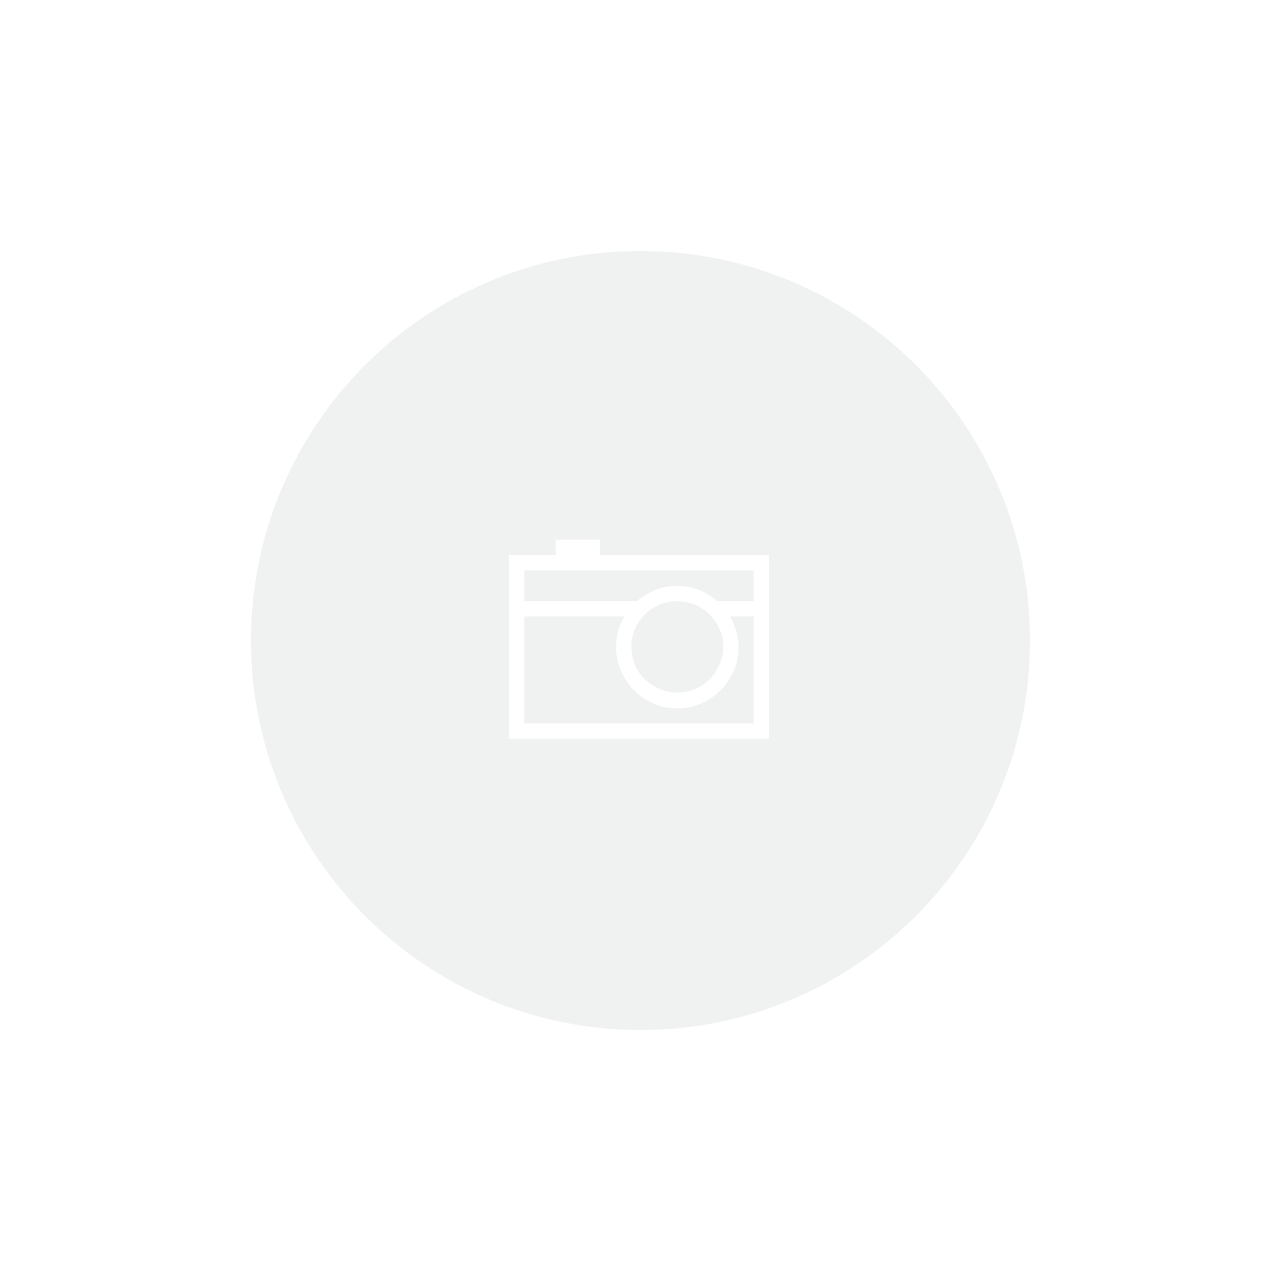 Garfo de Mesa Inox Ipanema Branco Tramontina